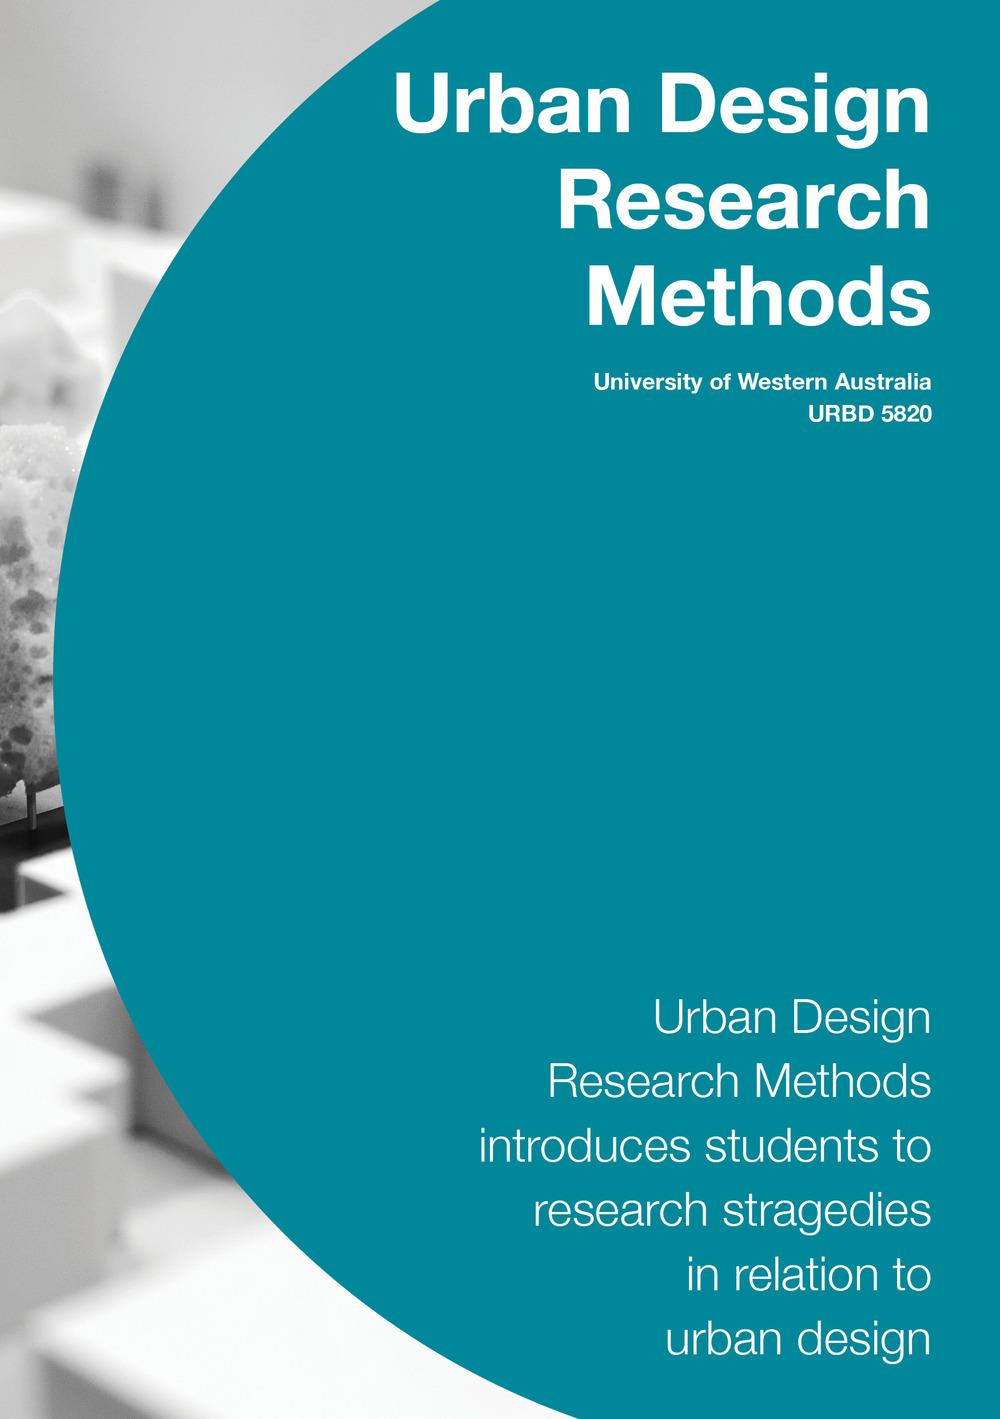 Urbandesignresearchmethods_Cover.jpg